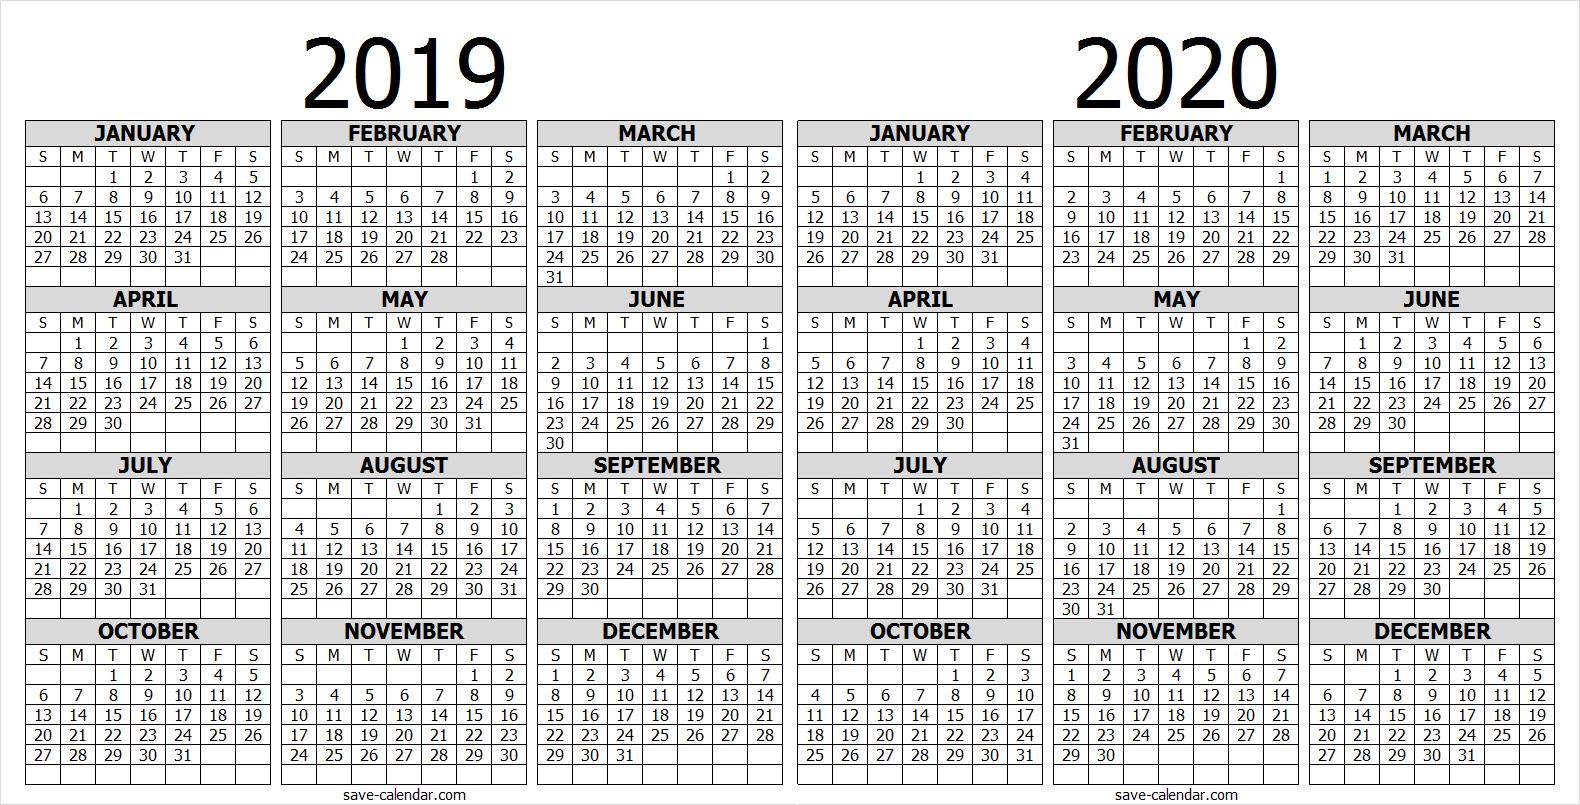 Calendar 2019 2020 One Page | 2019 Calendar | Free Calendar intended for Free Printaabke Calendars For 2019-2020